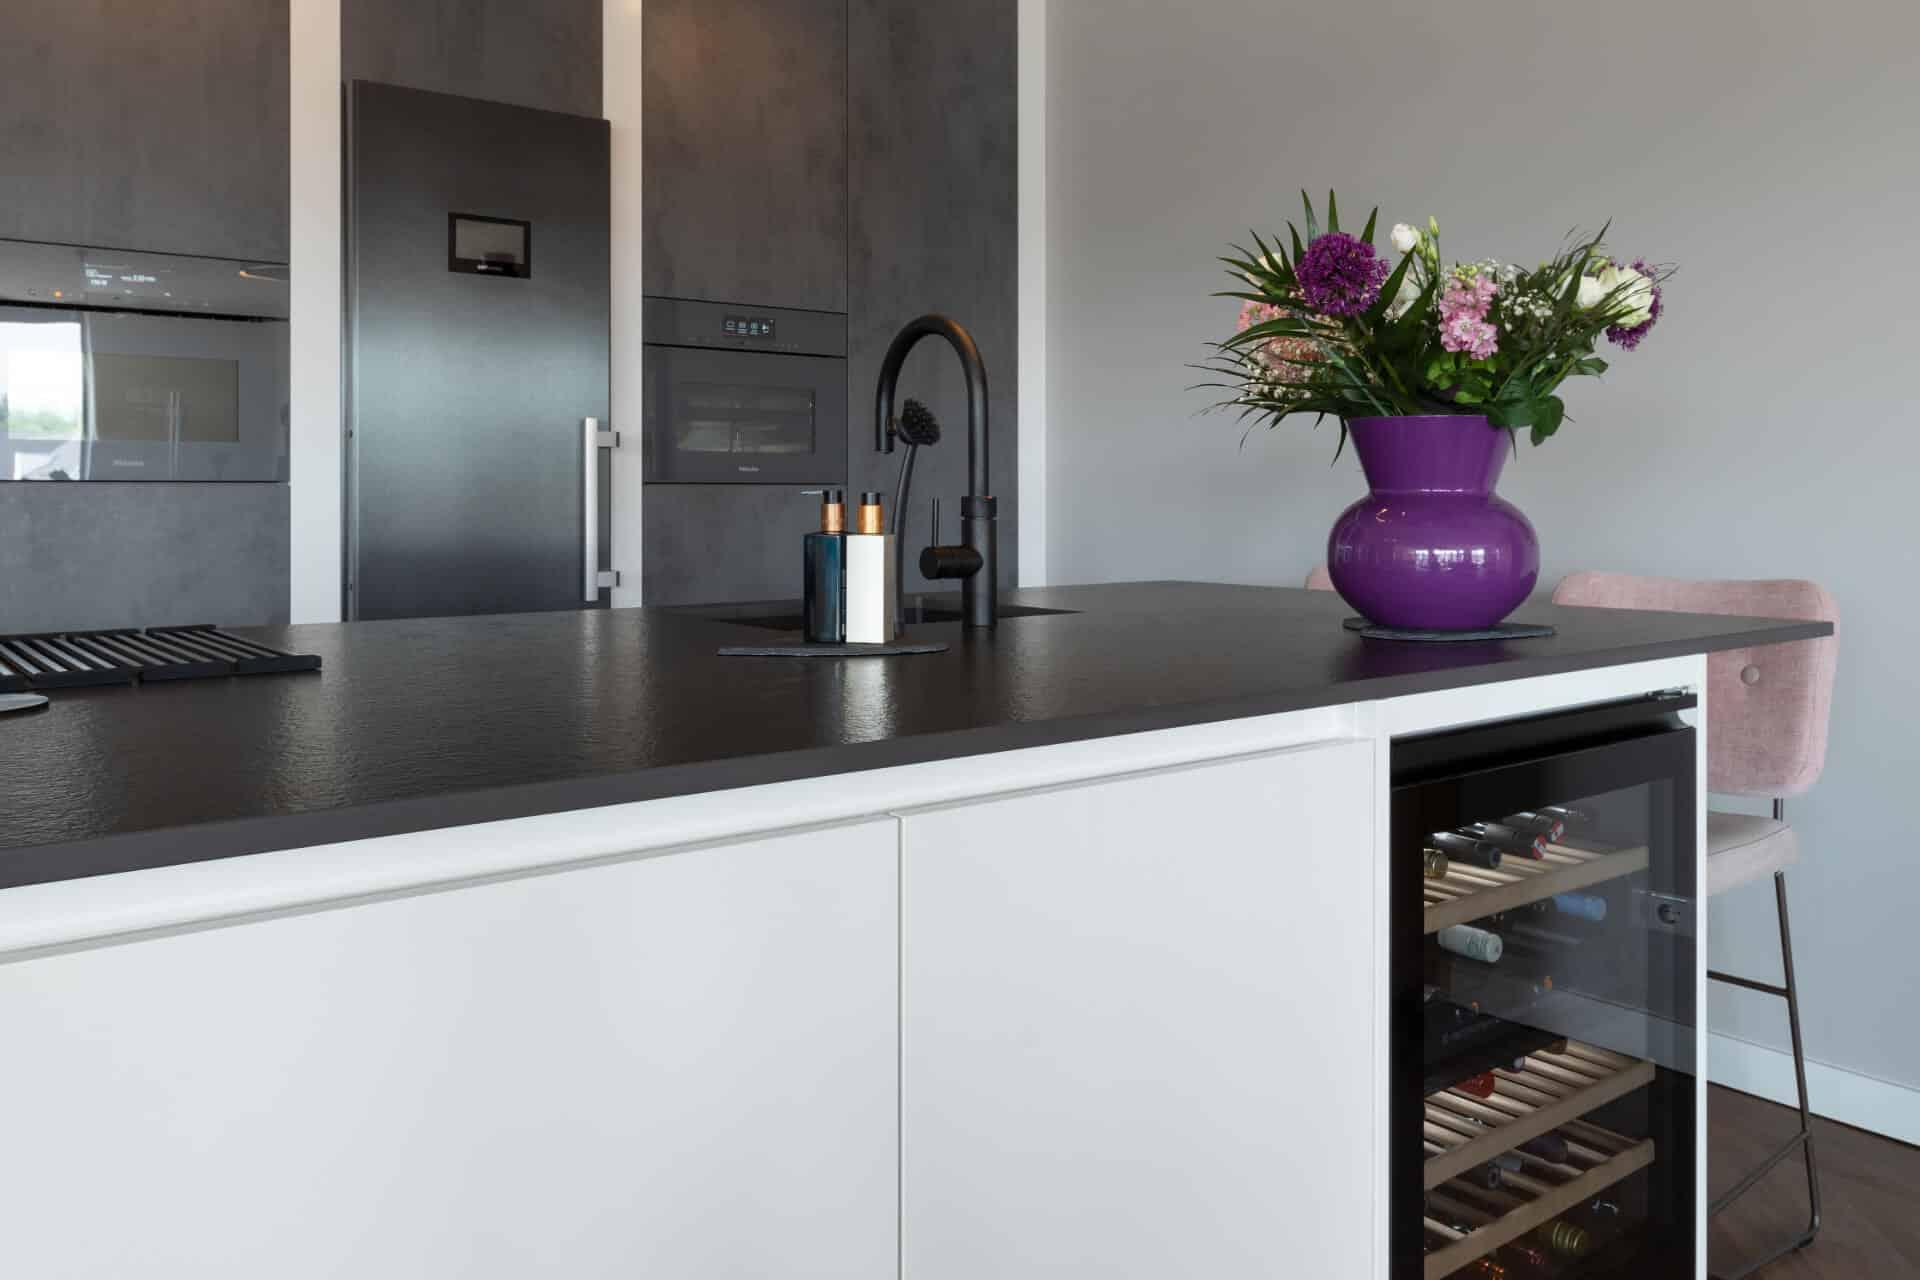 Stoere betonlook keuken met Miele apparatuur | Ede